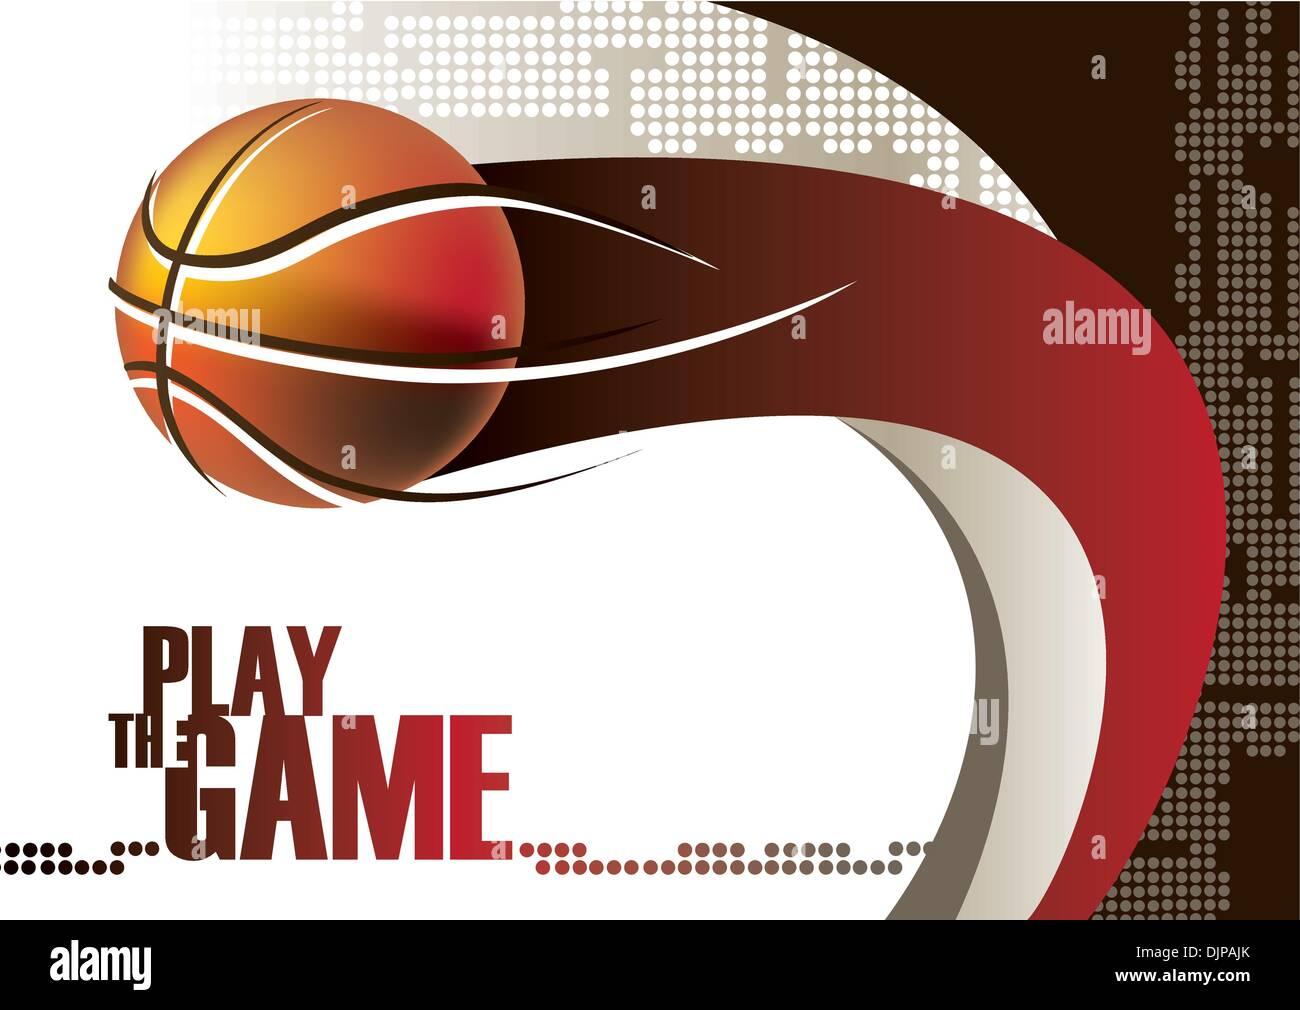 Wunderbar Basketball Klammer Vorlage Galerie - Entry Level Resume ...